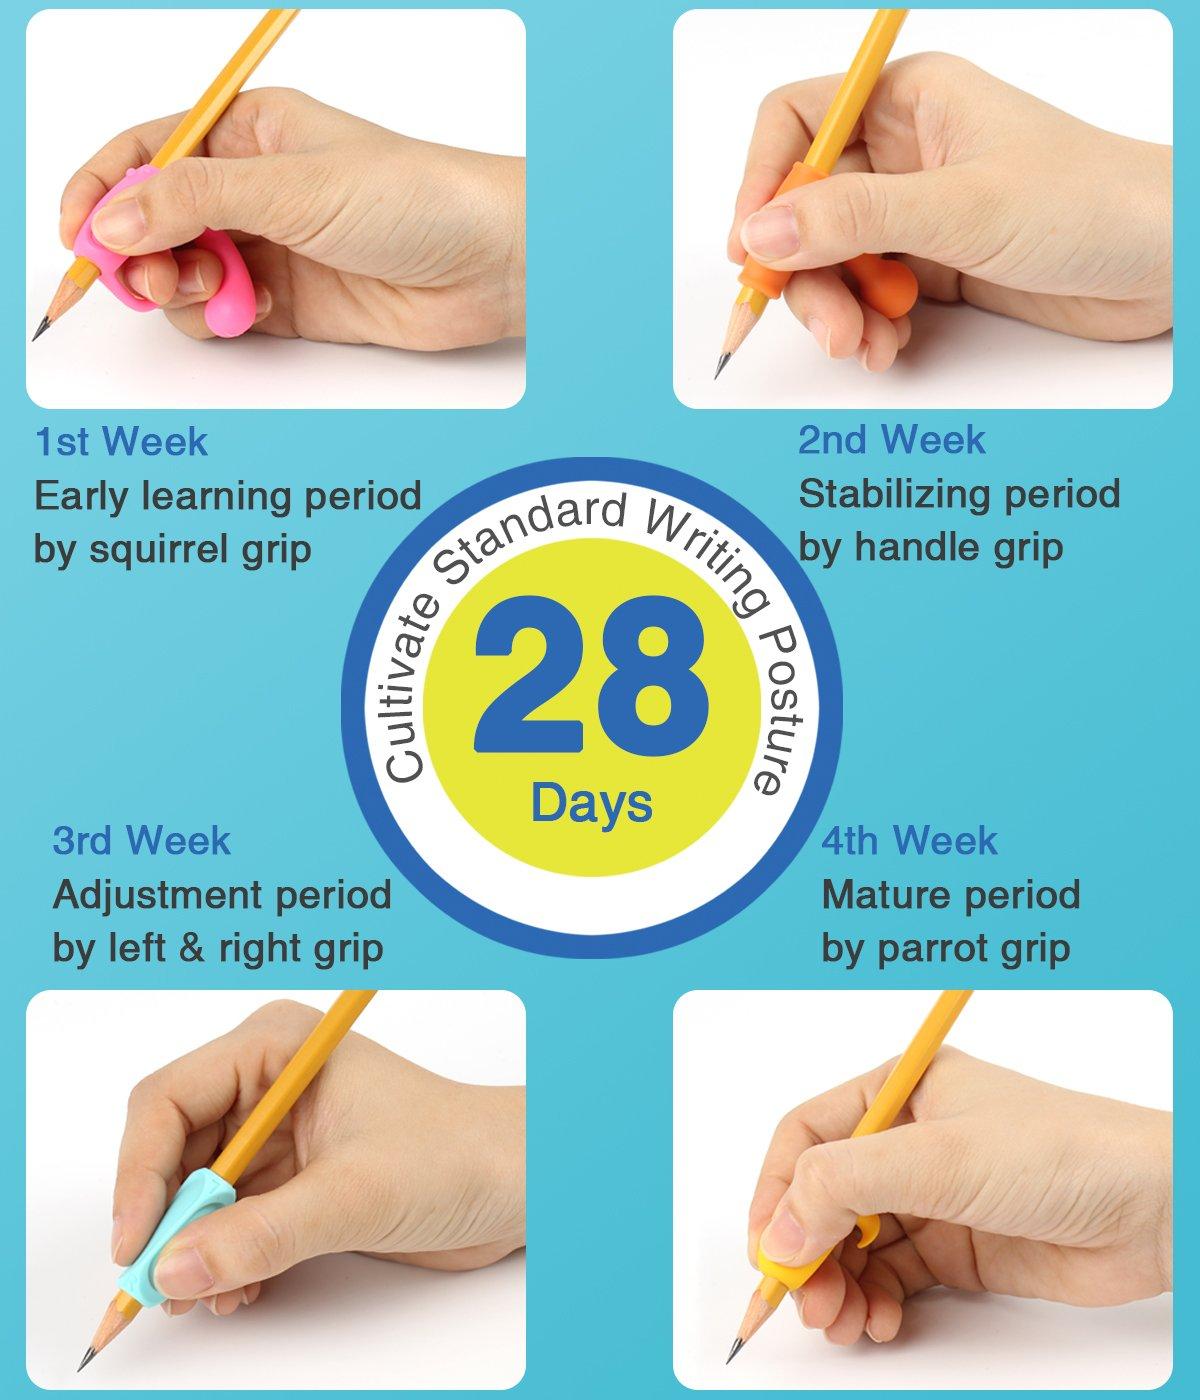 Agarrador de lapiz, Firesara Original Ergonomic Pen Holder Claw Postura de escritura correcta en 4 semanas para niños Kindergarten Adultos Necesidades ...